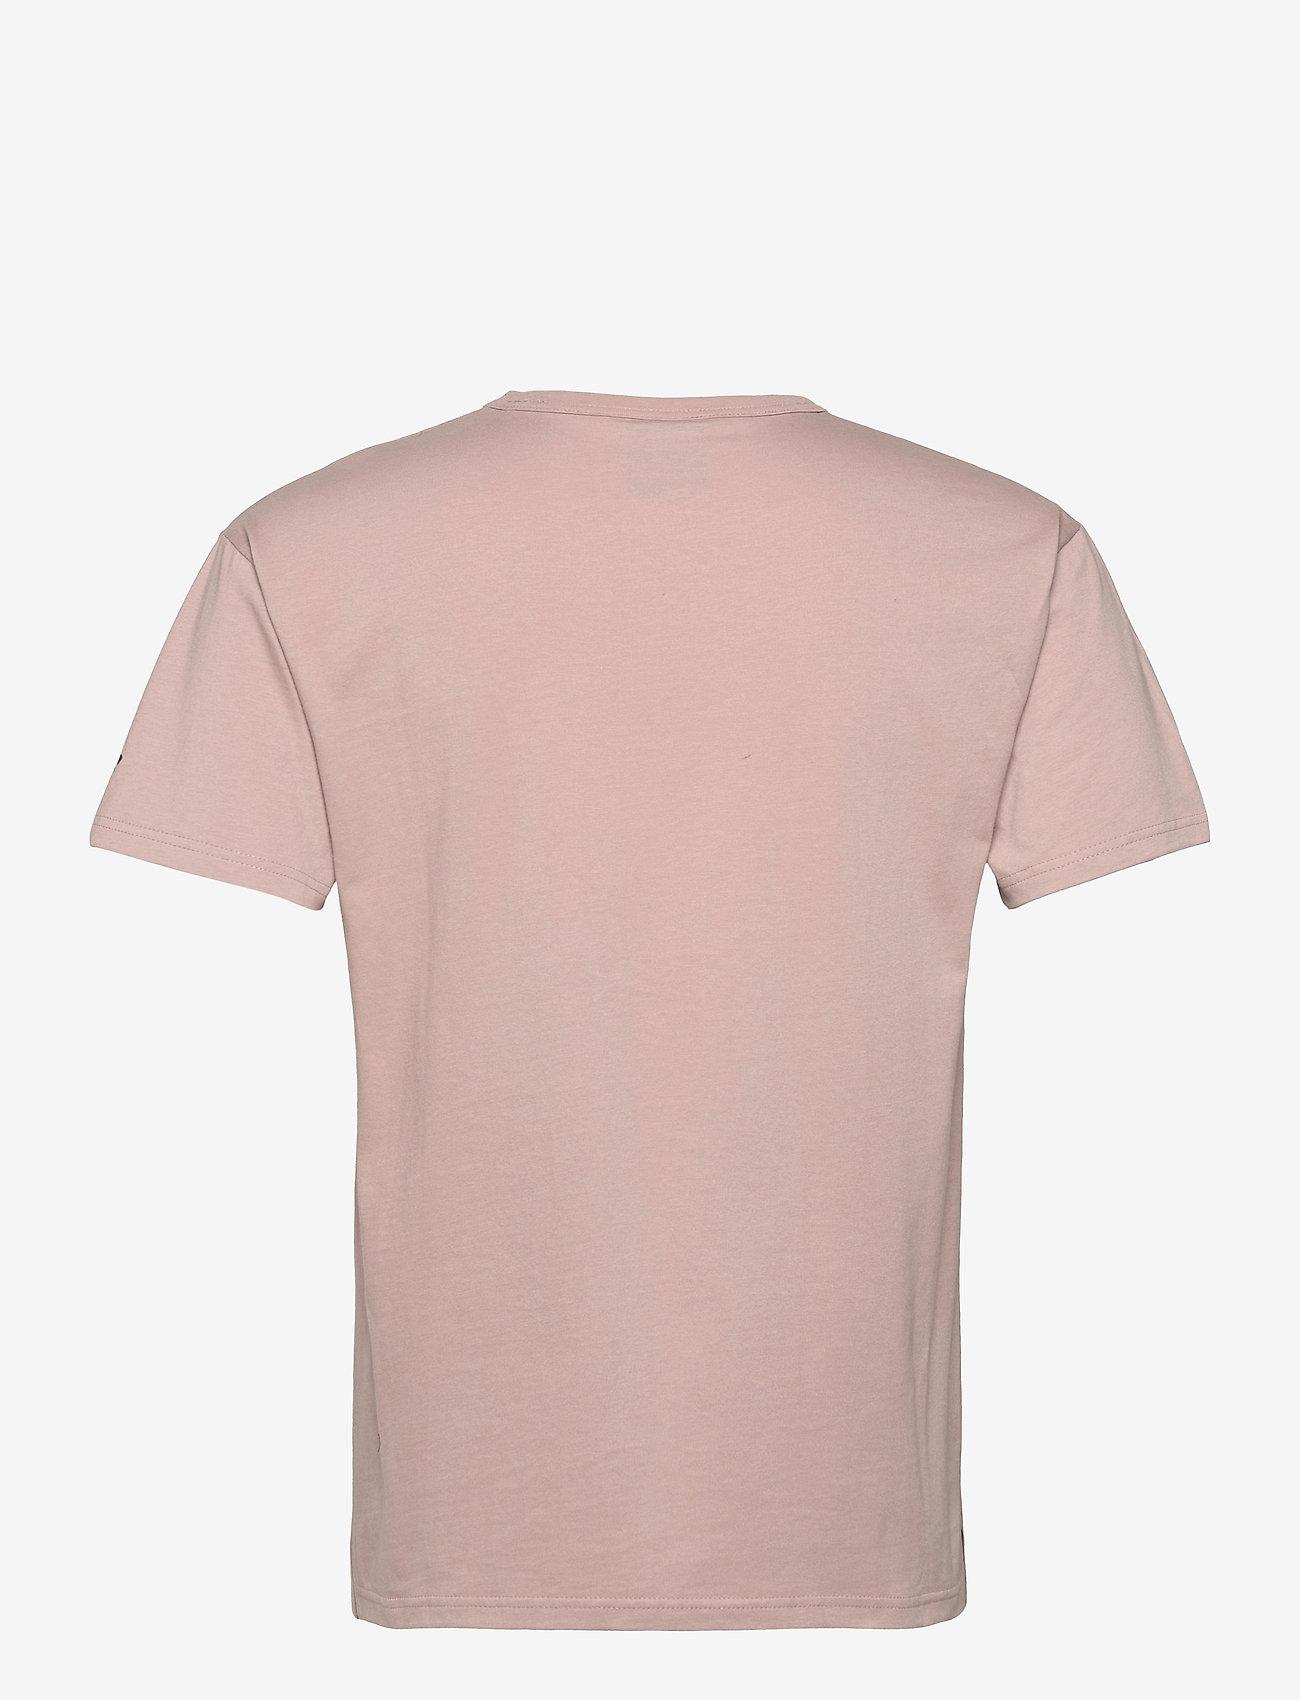 Fanatics - Las Vegas Raiders Diffusion SS21 T-Shirt - t-shirts - bark - 1